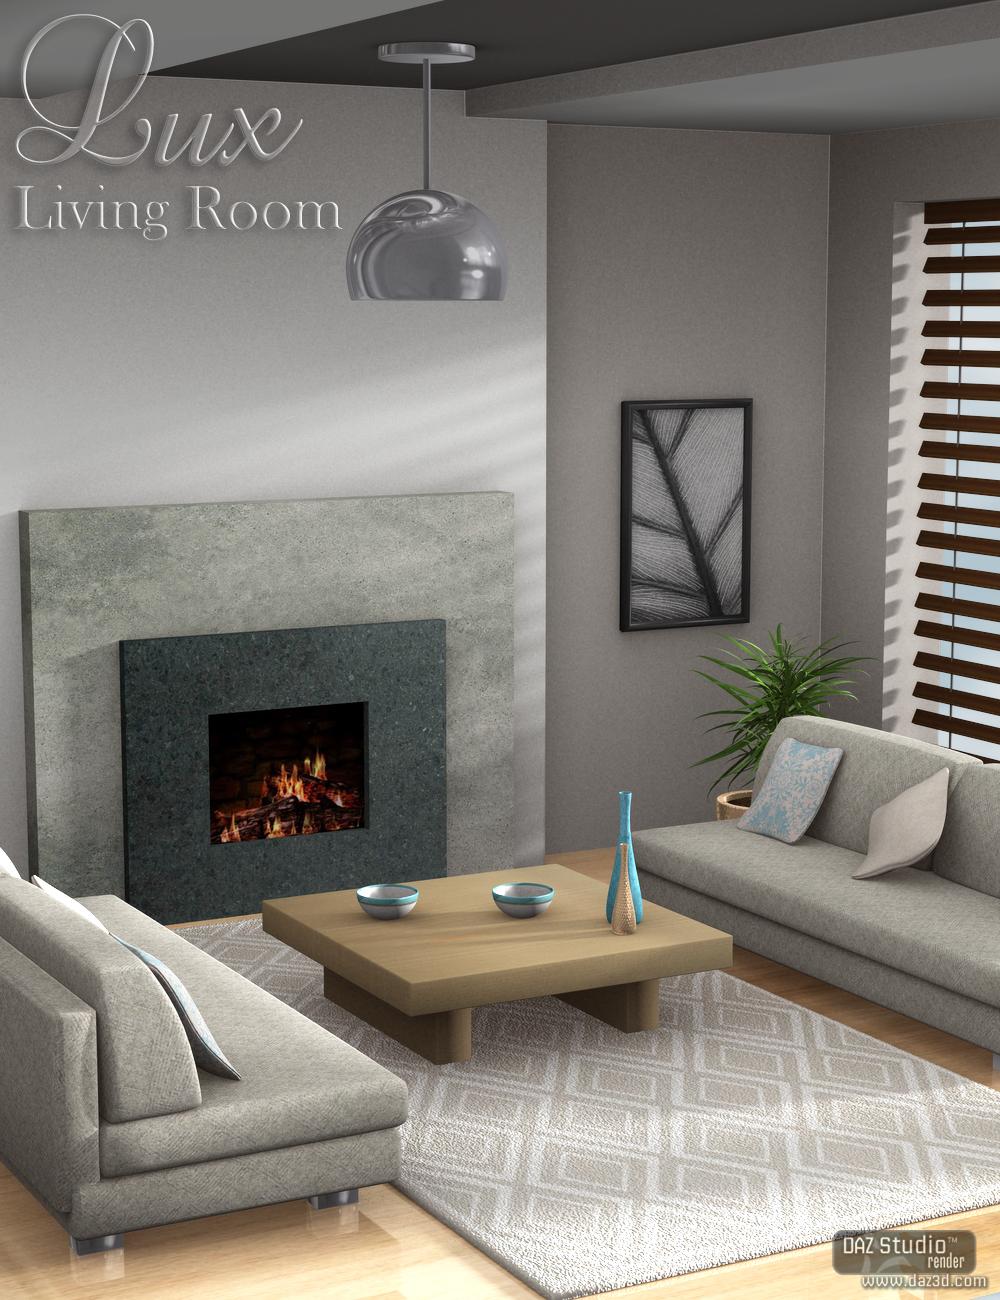 Lux Living Room Scene by: Nikisatez, 3D Models by Daz 3D